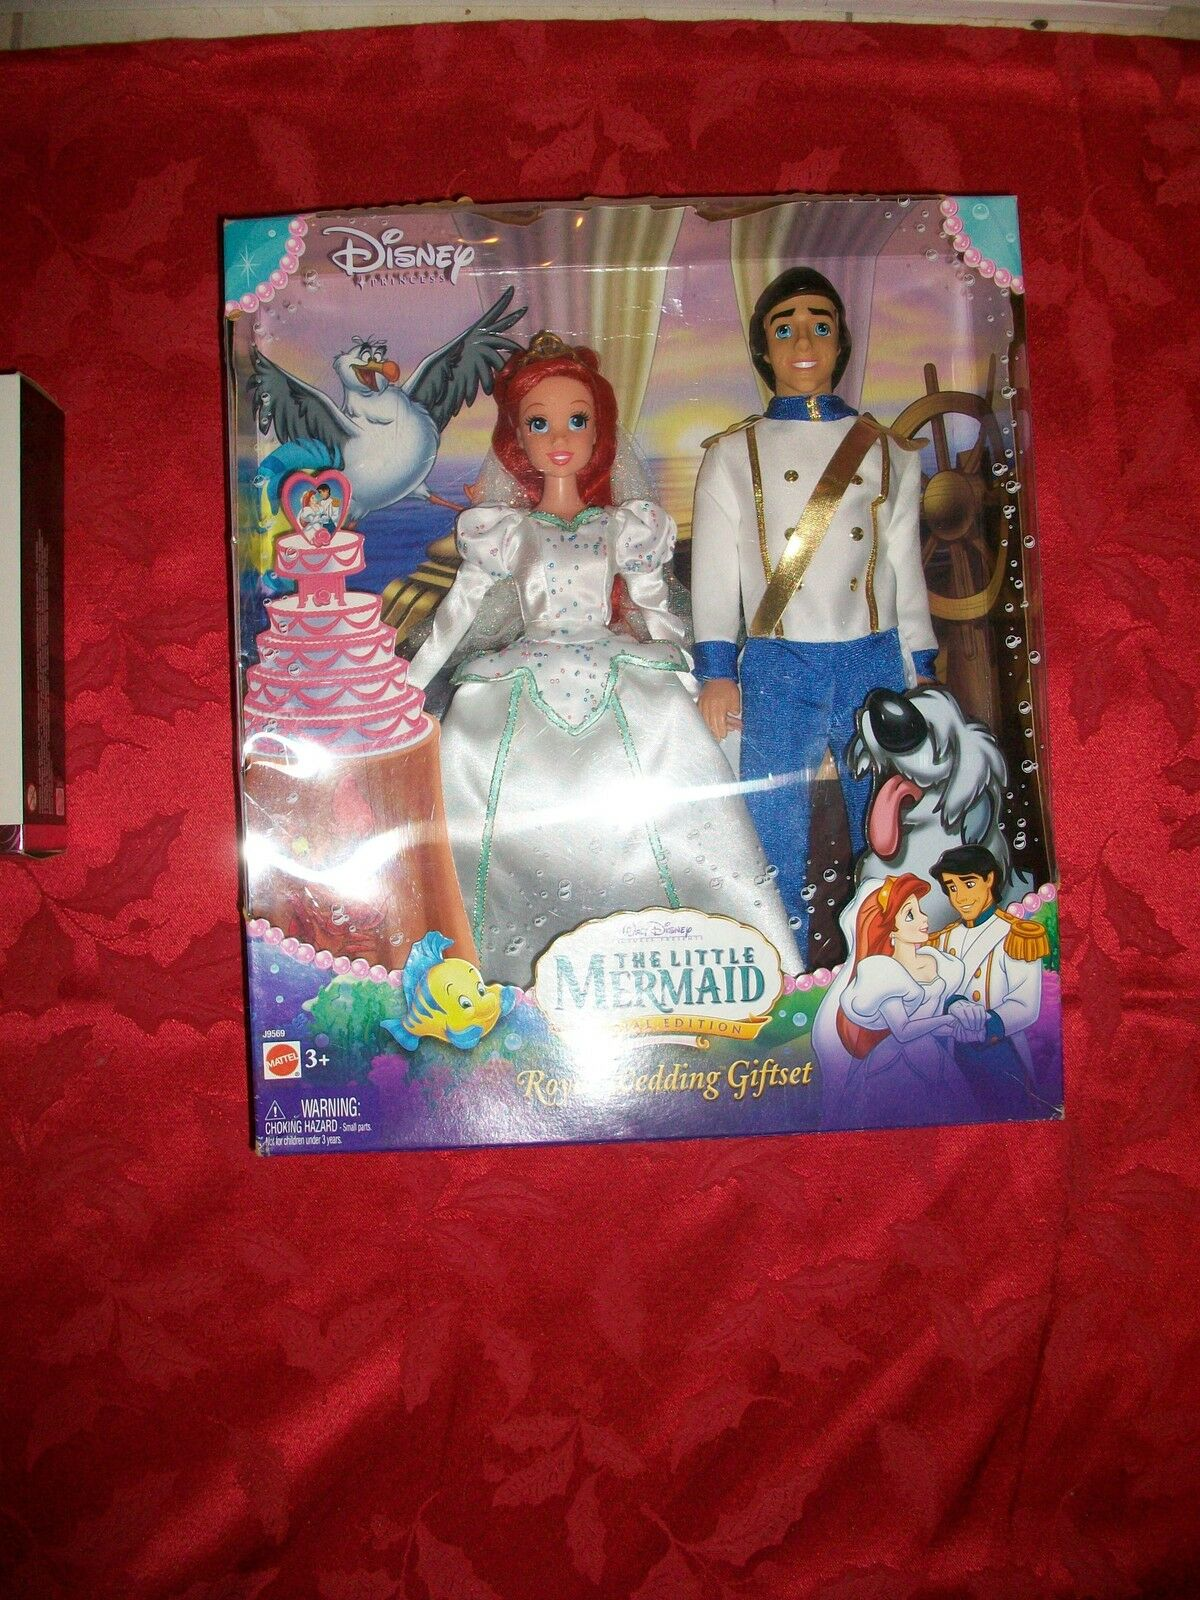 2006 Pequeña Sirena Boda Real Giftset Eric & Ariel Muñeca